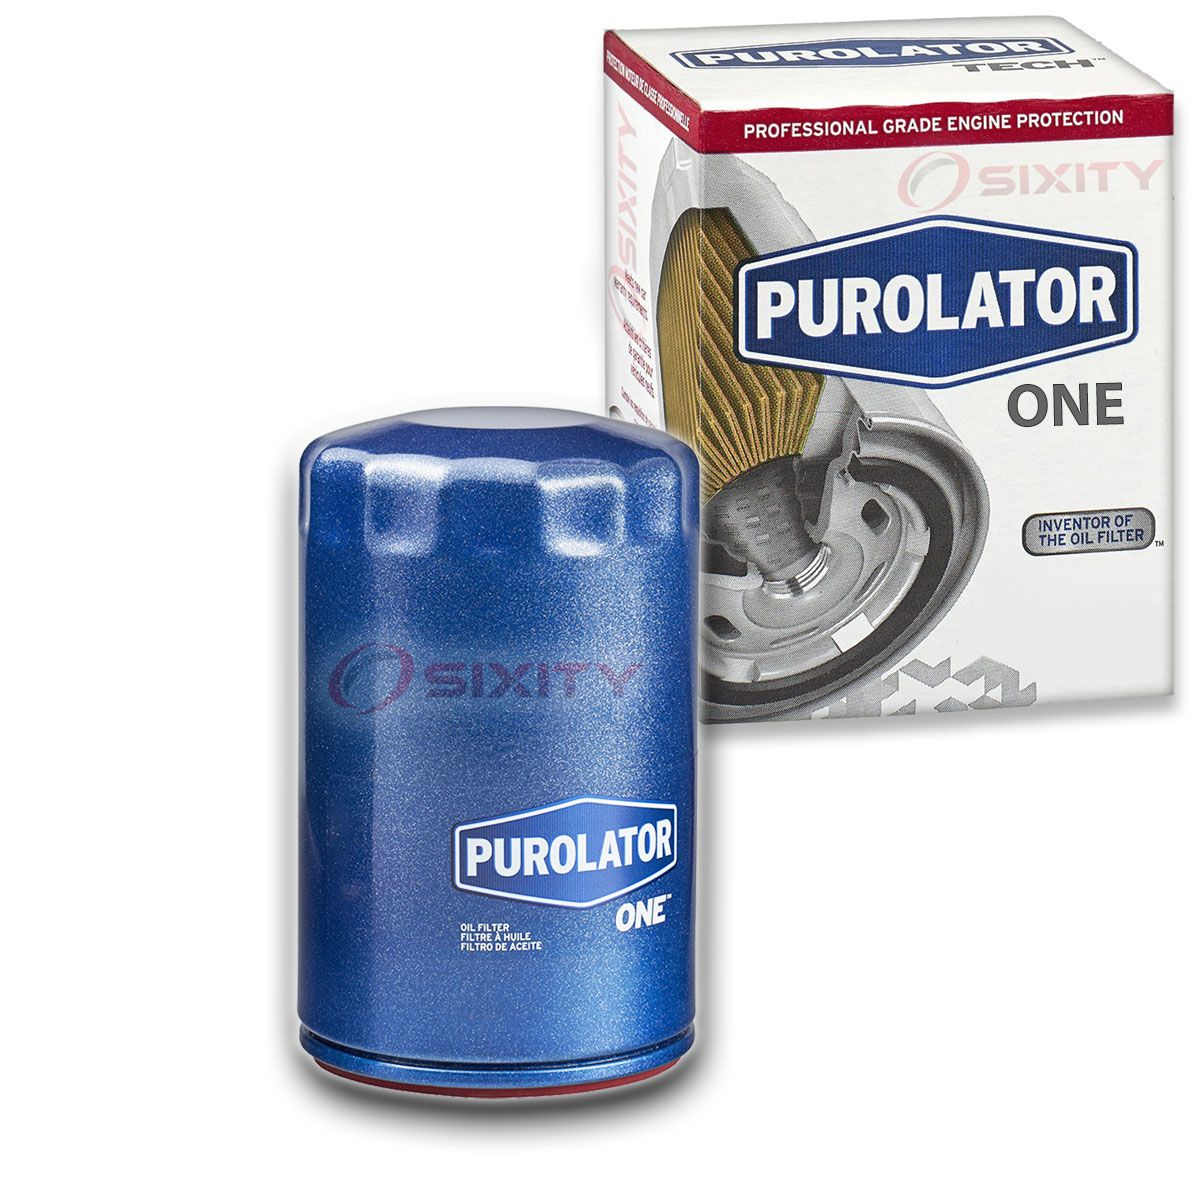 Purolator PL20195 PurolatorONE Oil Filter Pack of 2